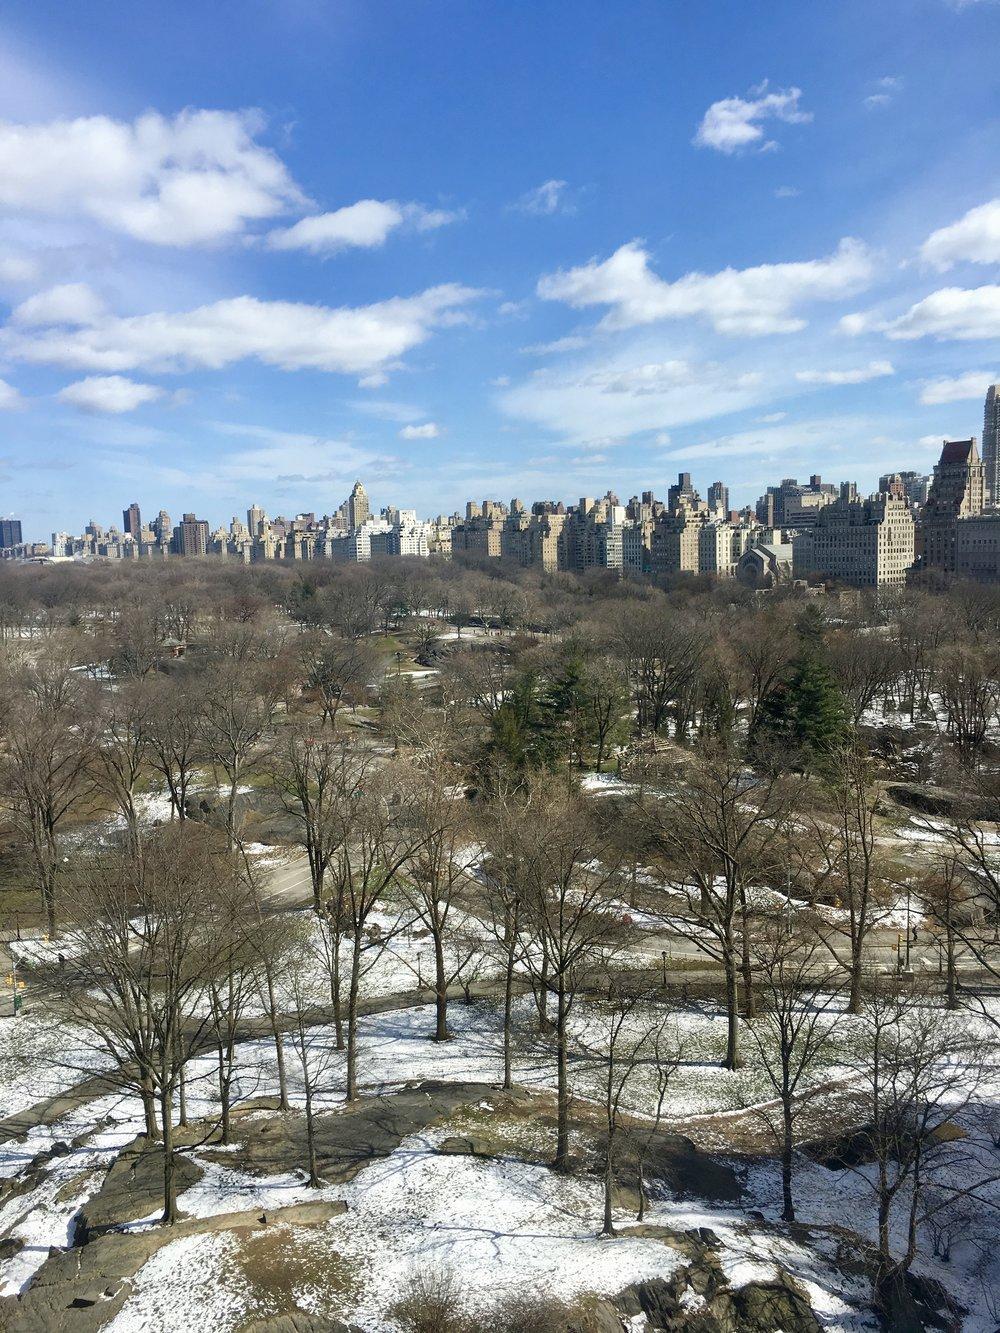 Samantha McNeil Blog // Central Park View from the JW Marriott Essex Rachel